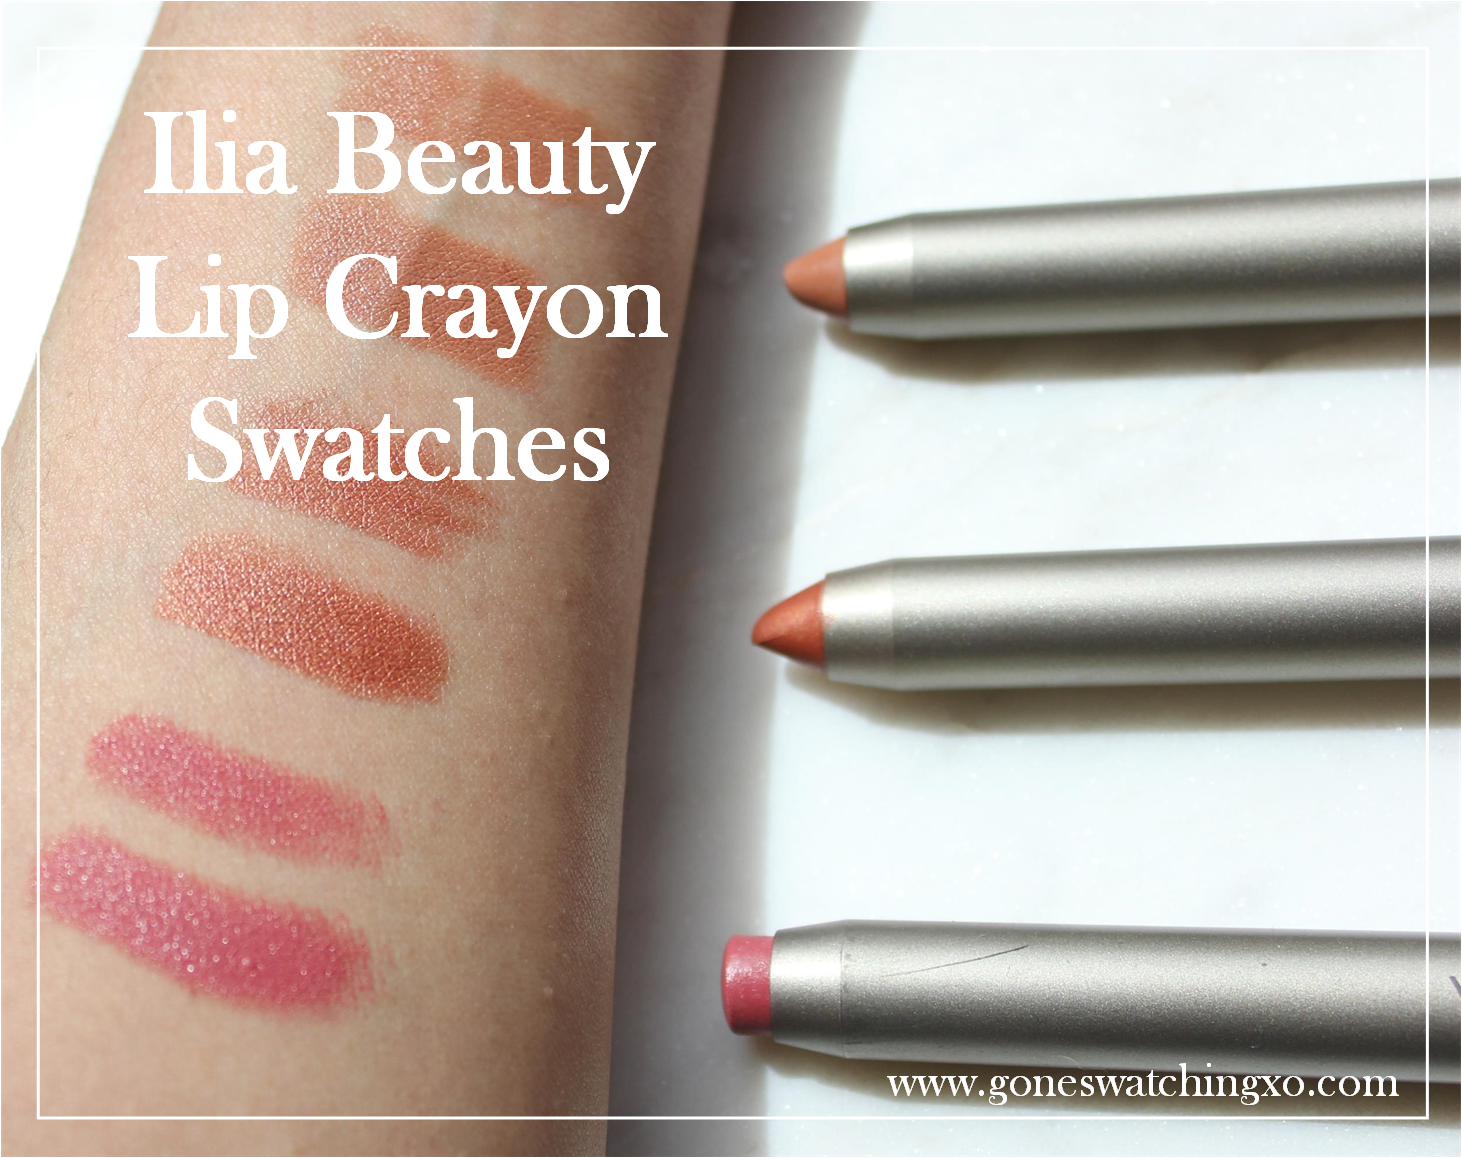 Ilia Beauty Organic and Natural Lip Crayon Review and